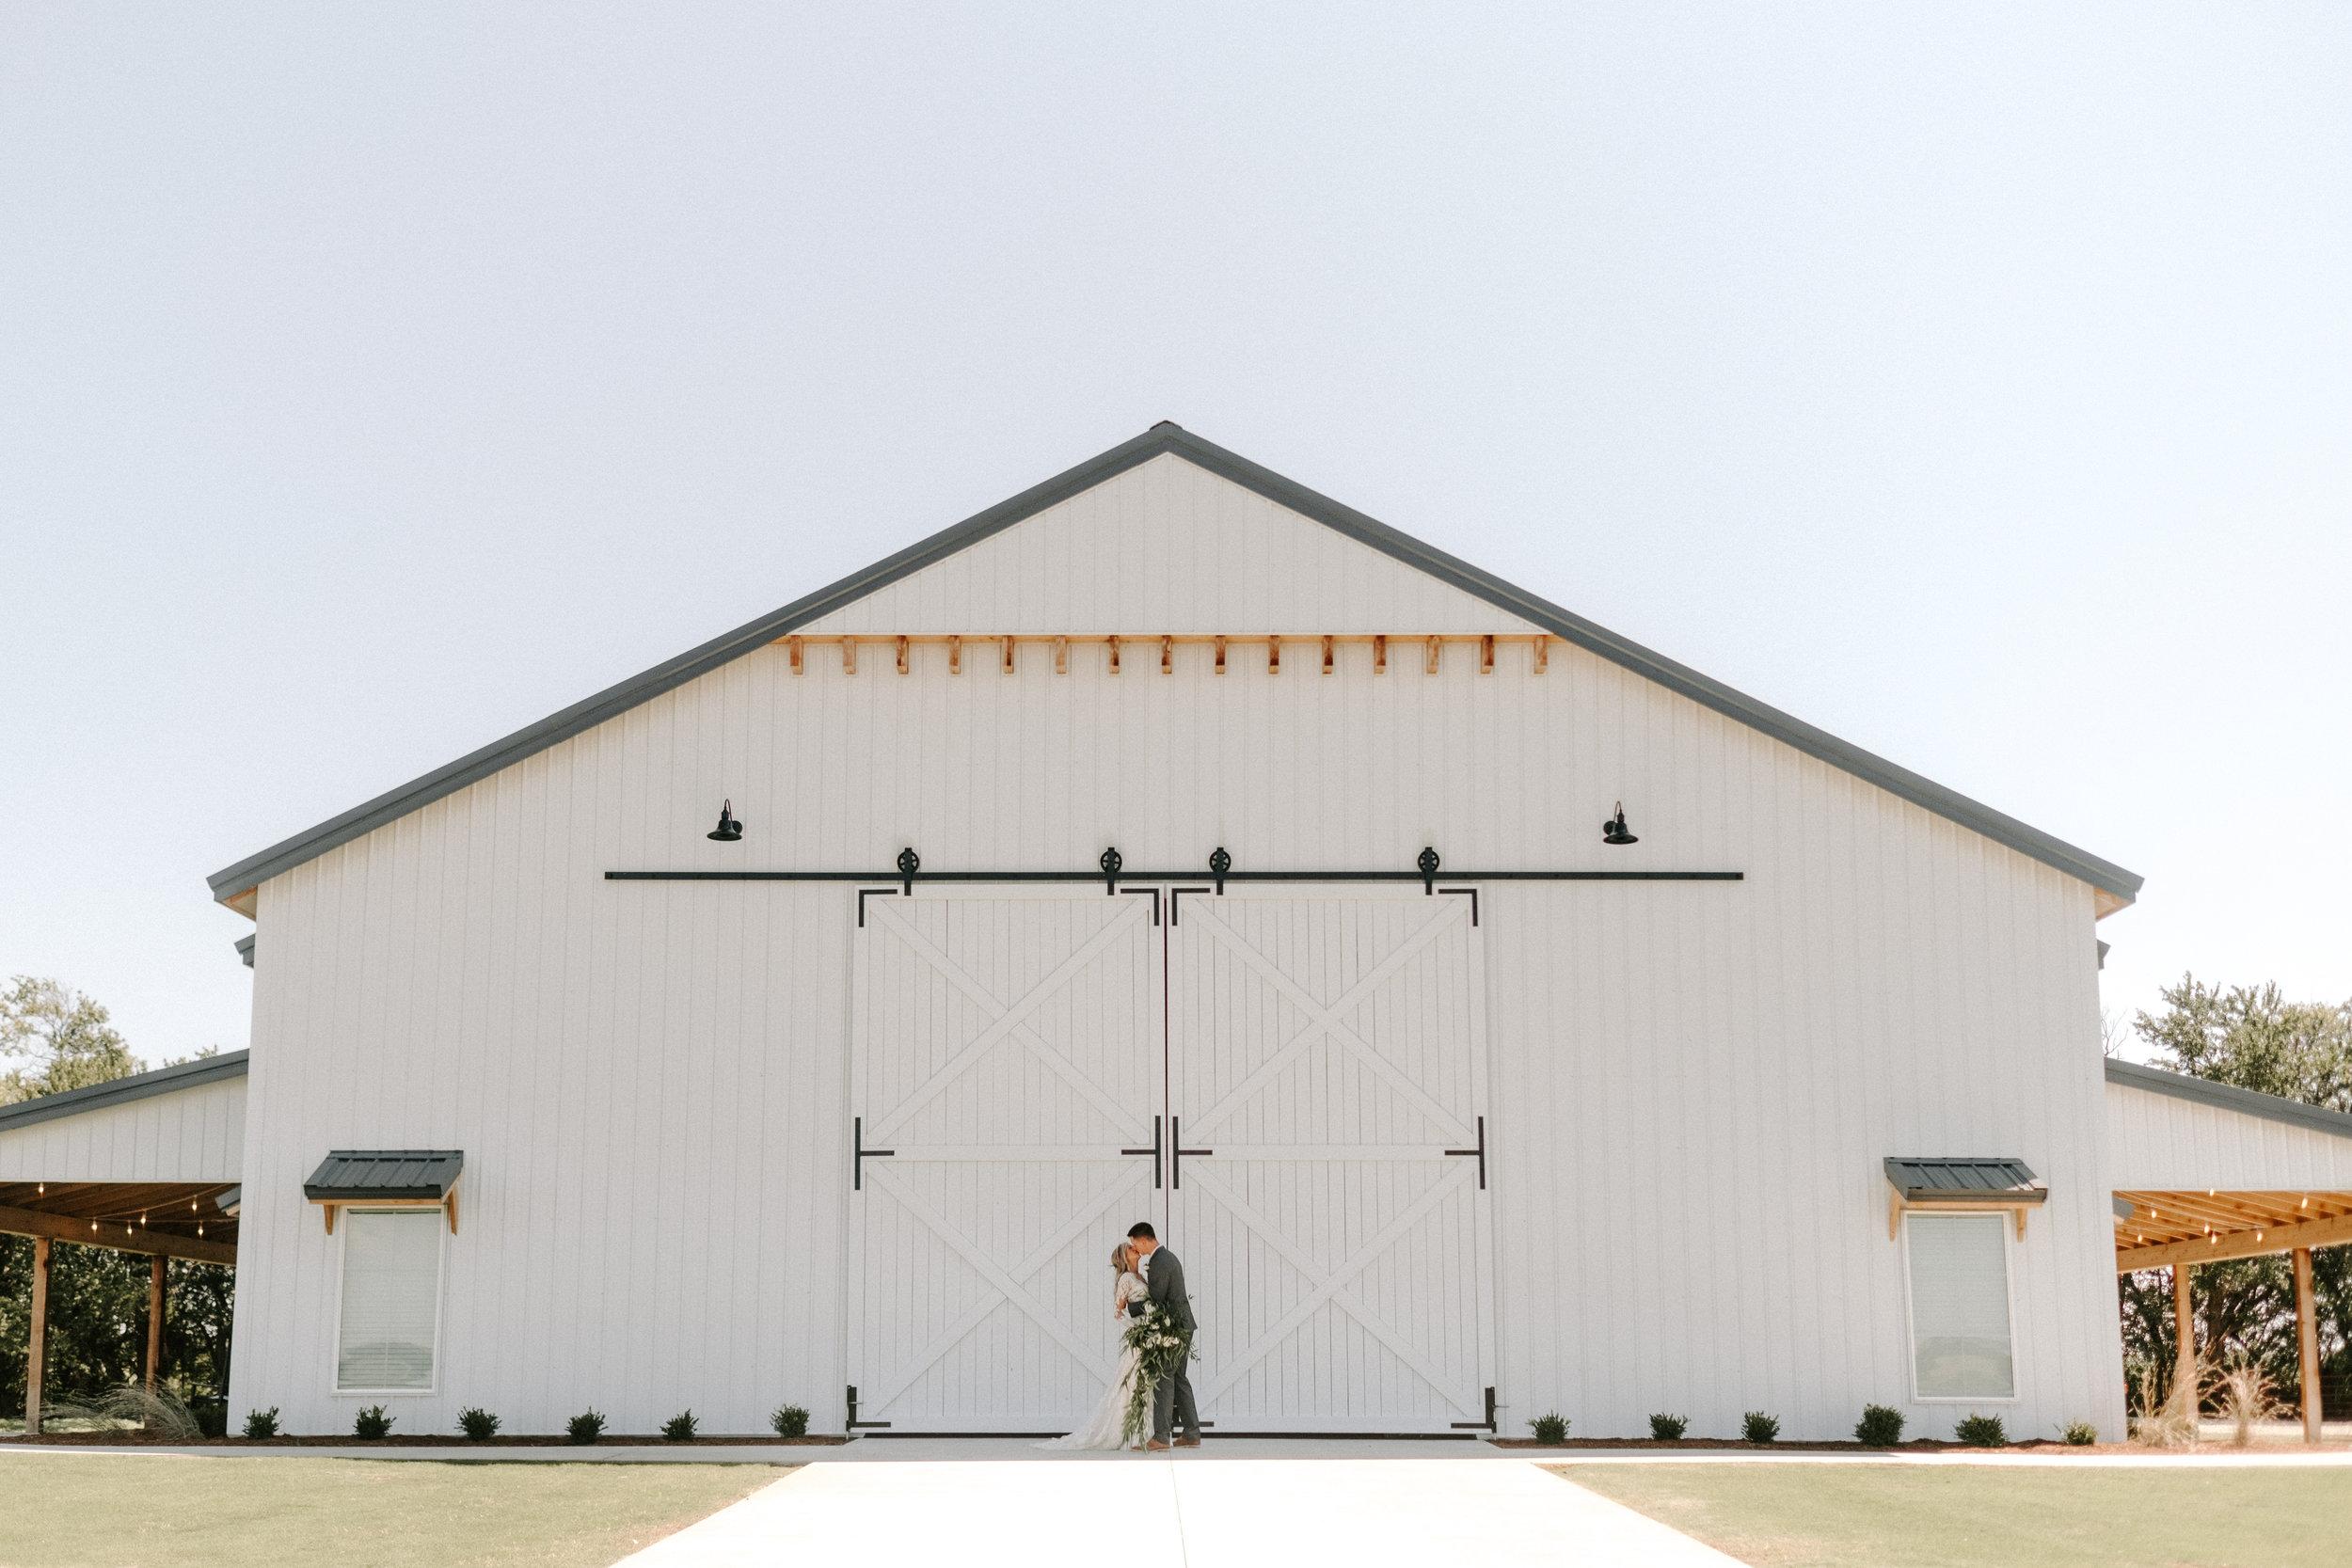 The-Barn-at-Grace-Hill-Wichita-Wedding-Venue-226.jpg